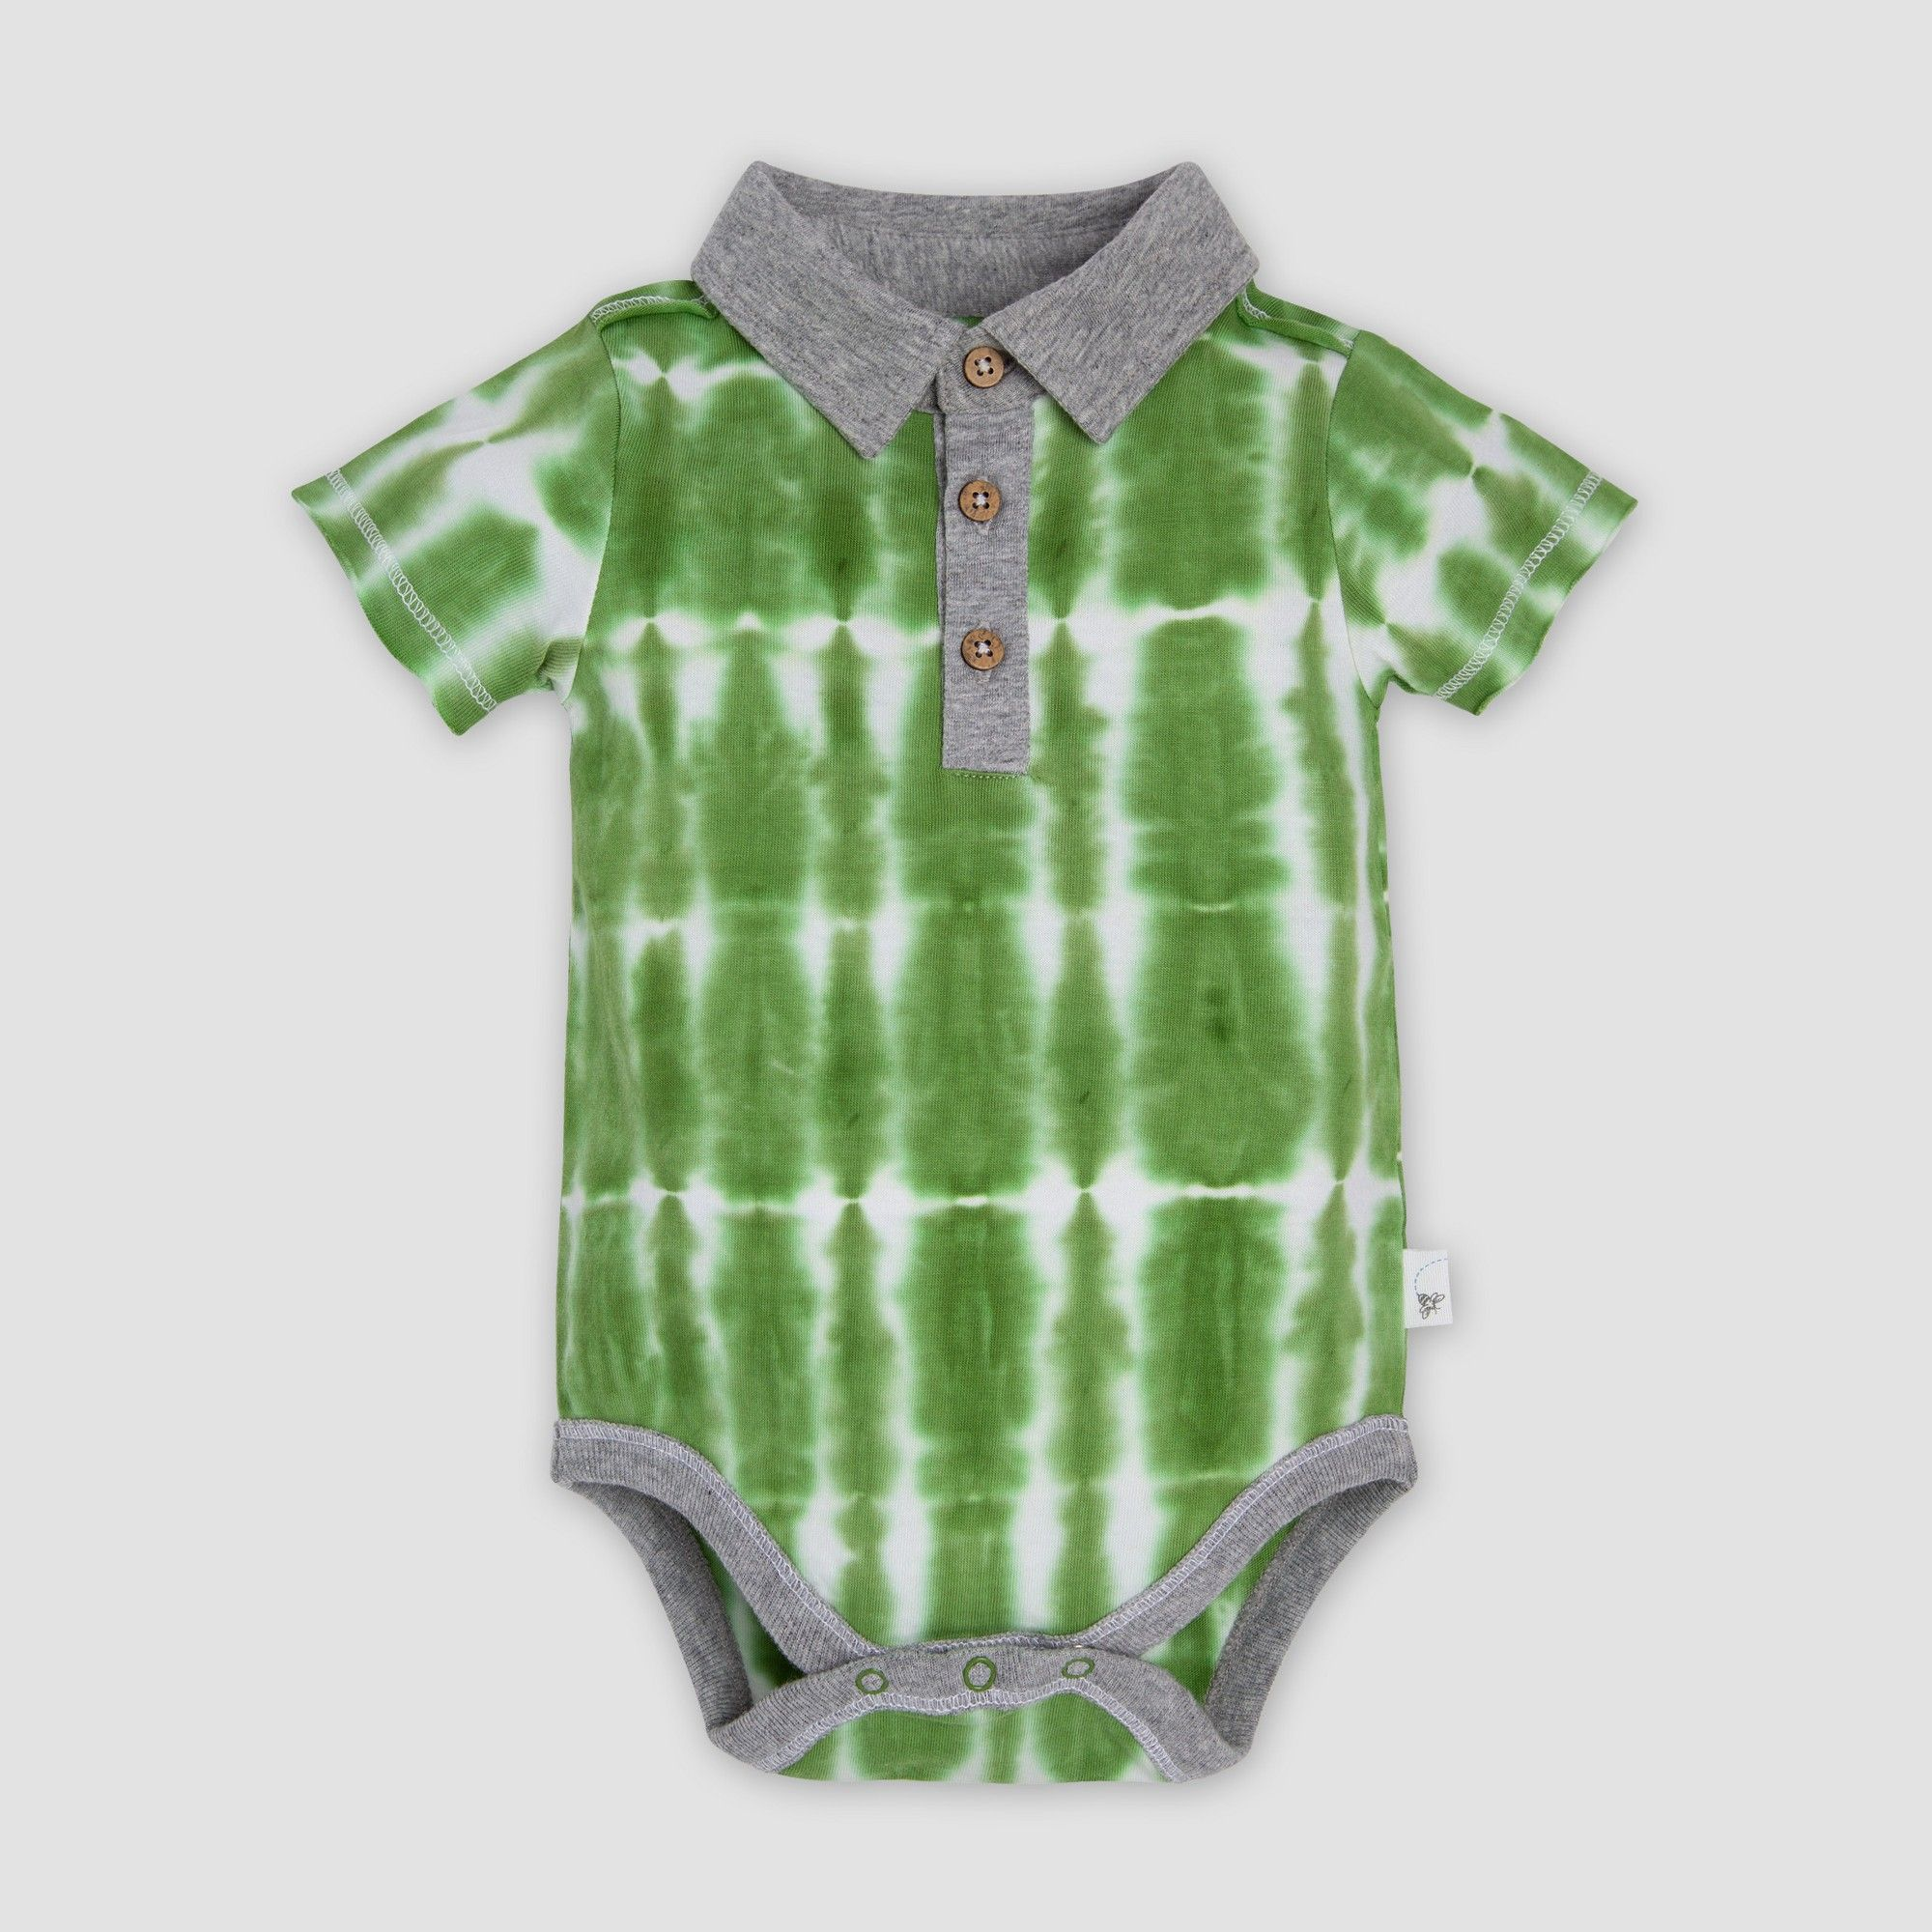 Tie Dye Baby Boy Girl 100/% Cotton Body Suit Shower Gift Unique PJs Black Grey